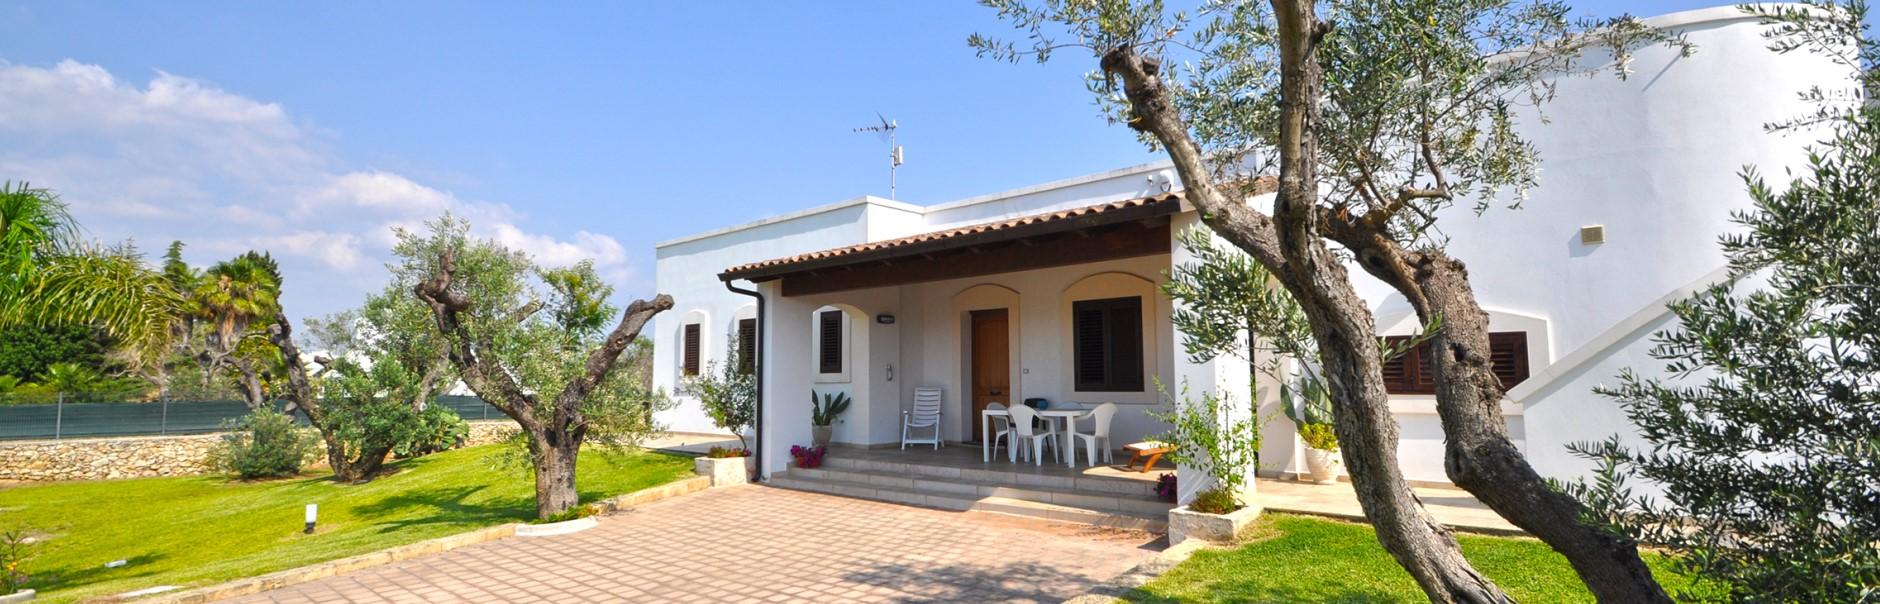 Villa De Luca - Gallipoli